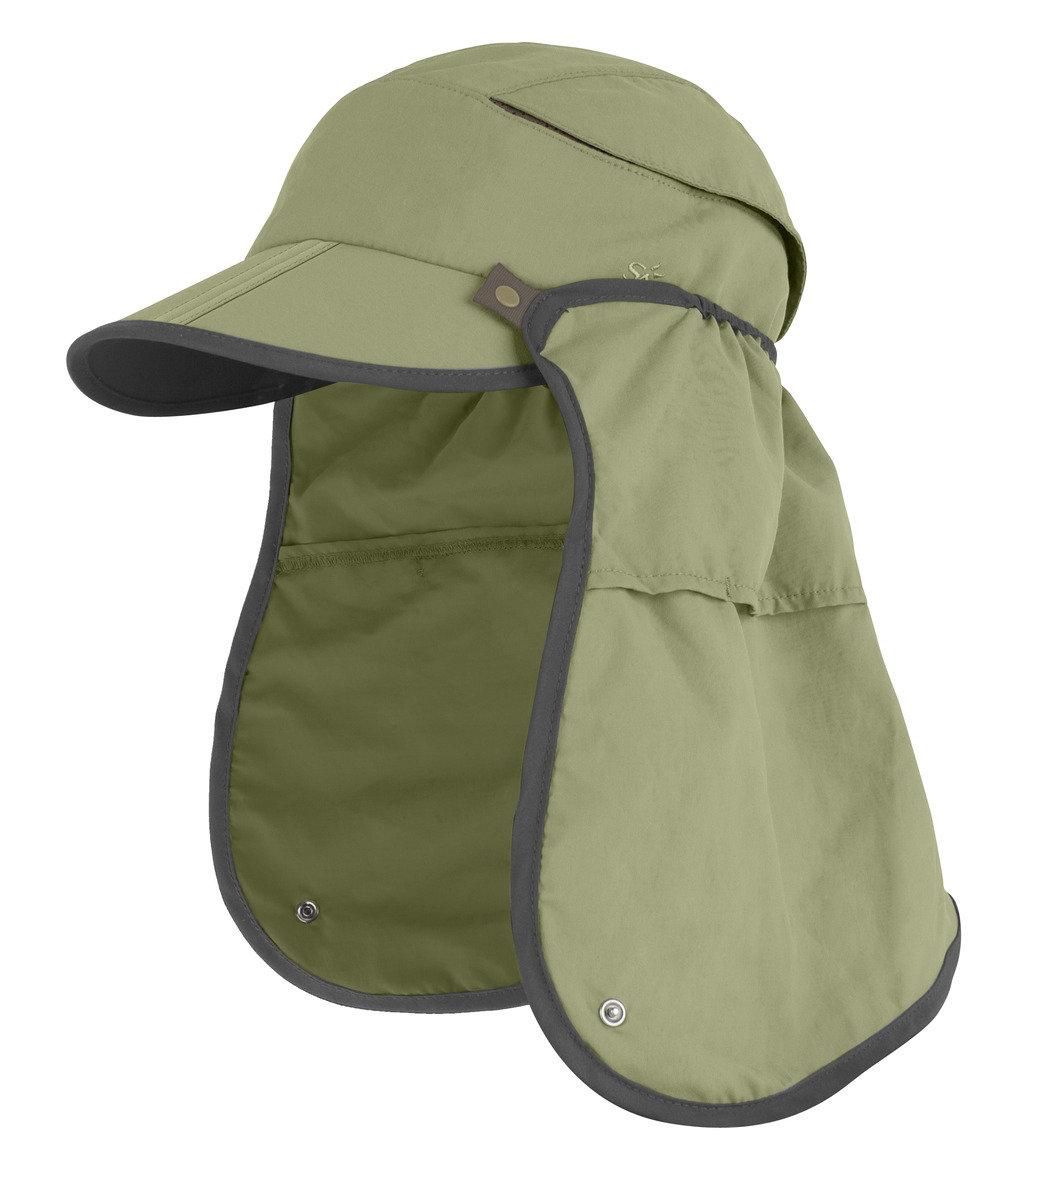 美國永久最高防曬帽 - Sun Guide Cap, Olive M